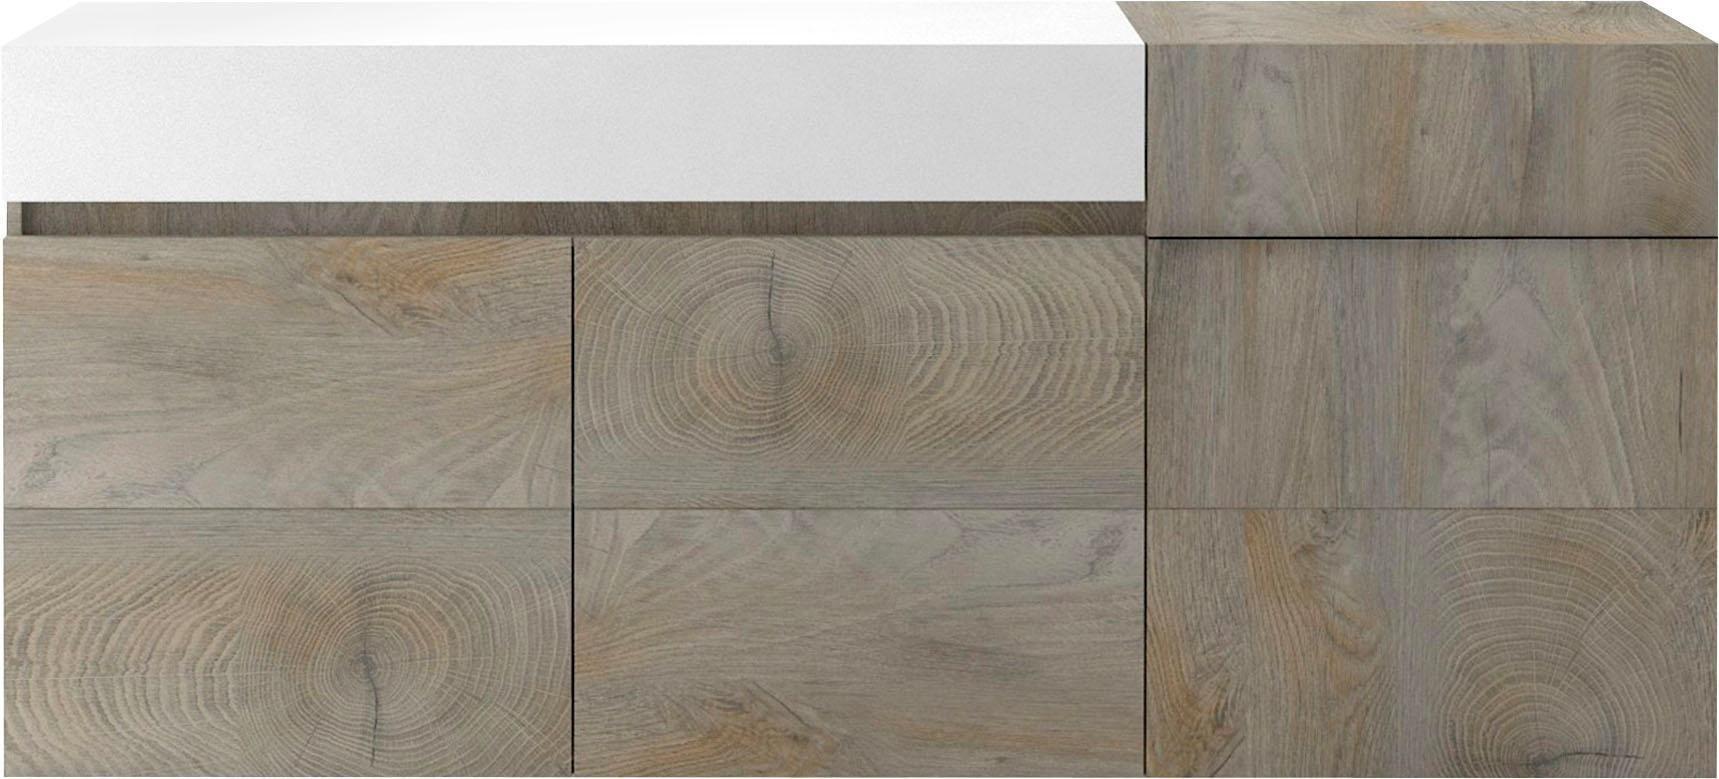 Kommoden Holz Massiv Langes Sideboard Badezimmer Kommode Schmal Kommode 35 Cm Tiefe Schwarz Kommode Mit Schubladen Buch Sideboard Side Board Spanplatte